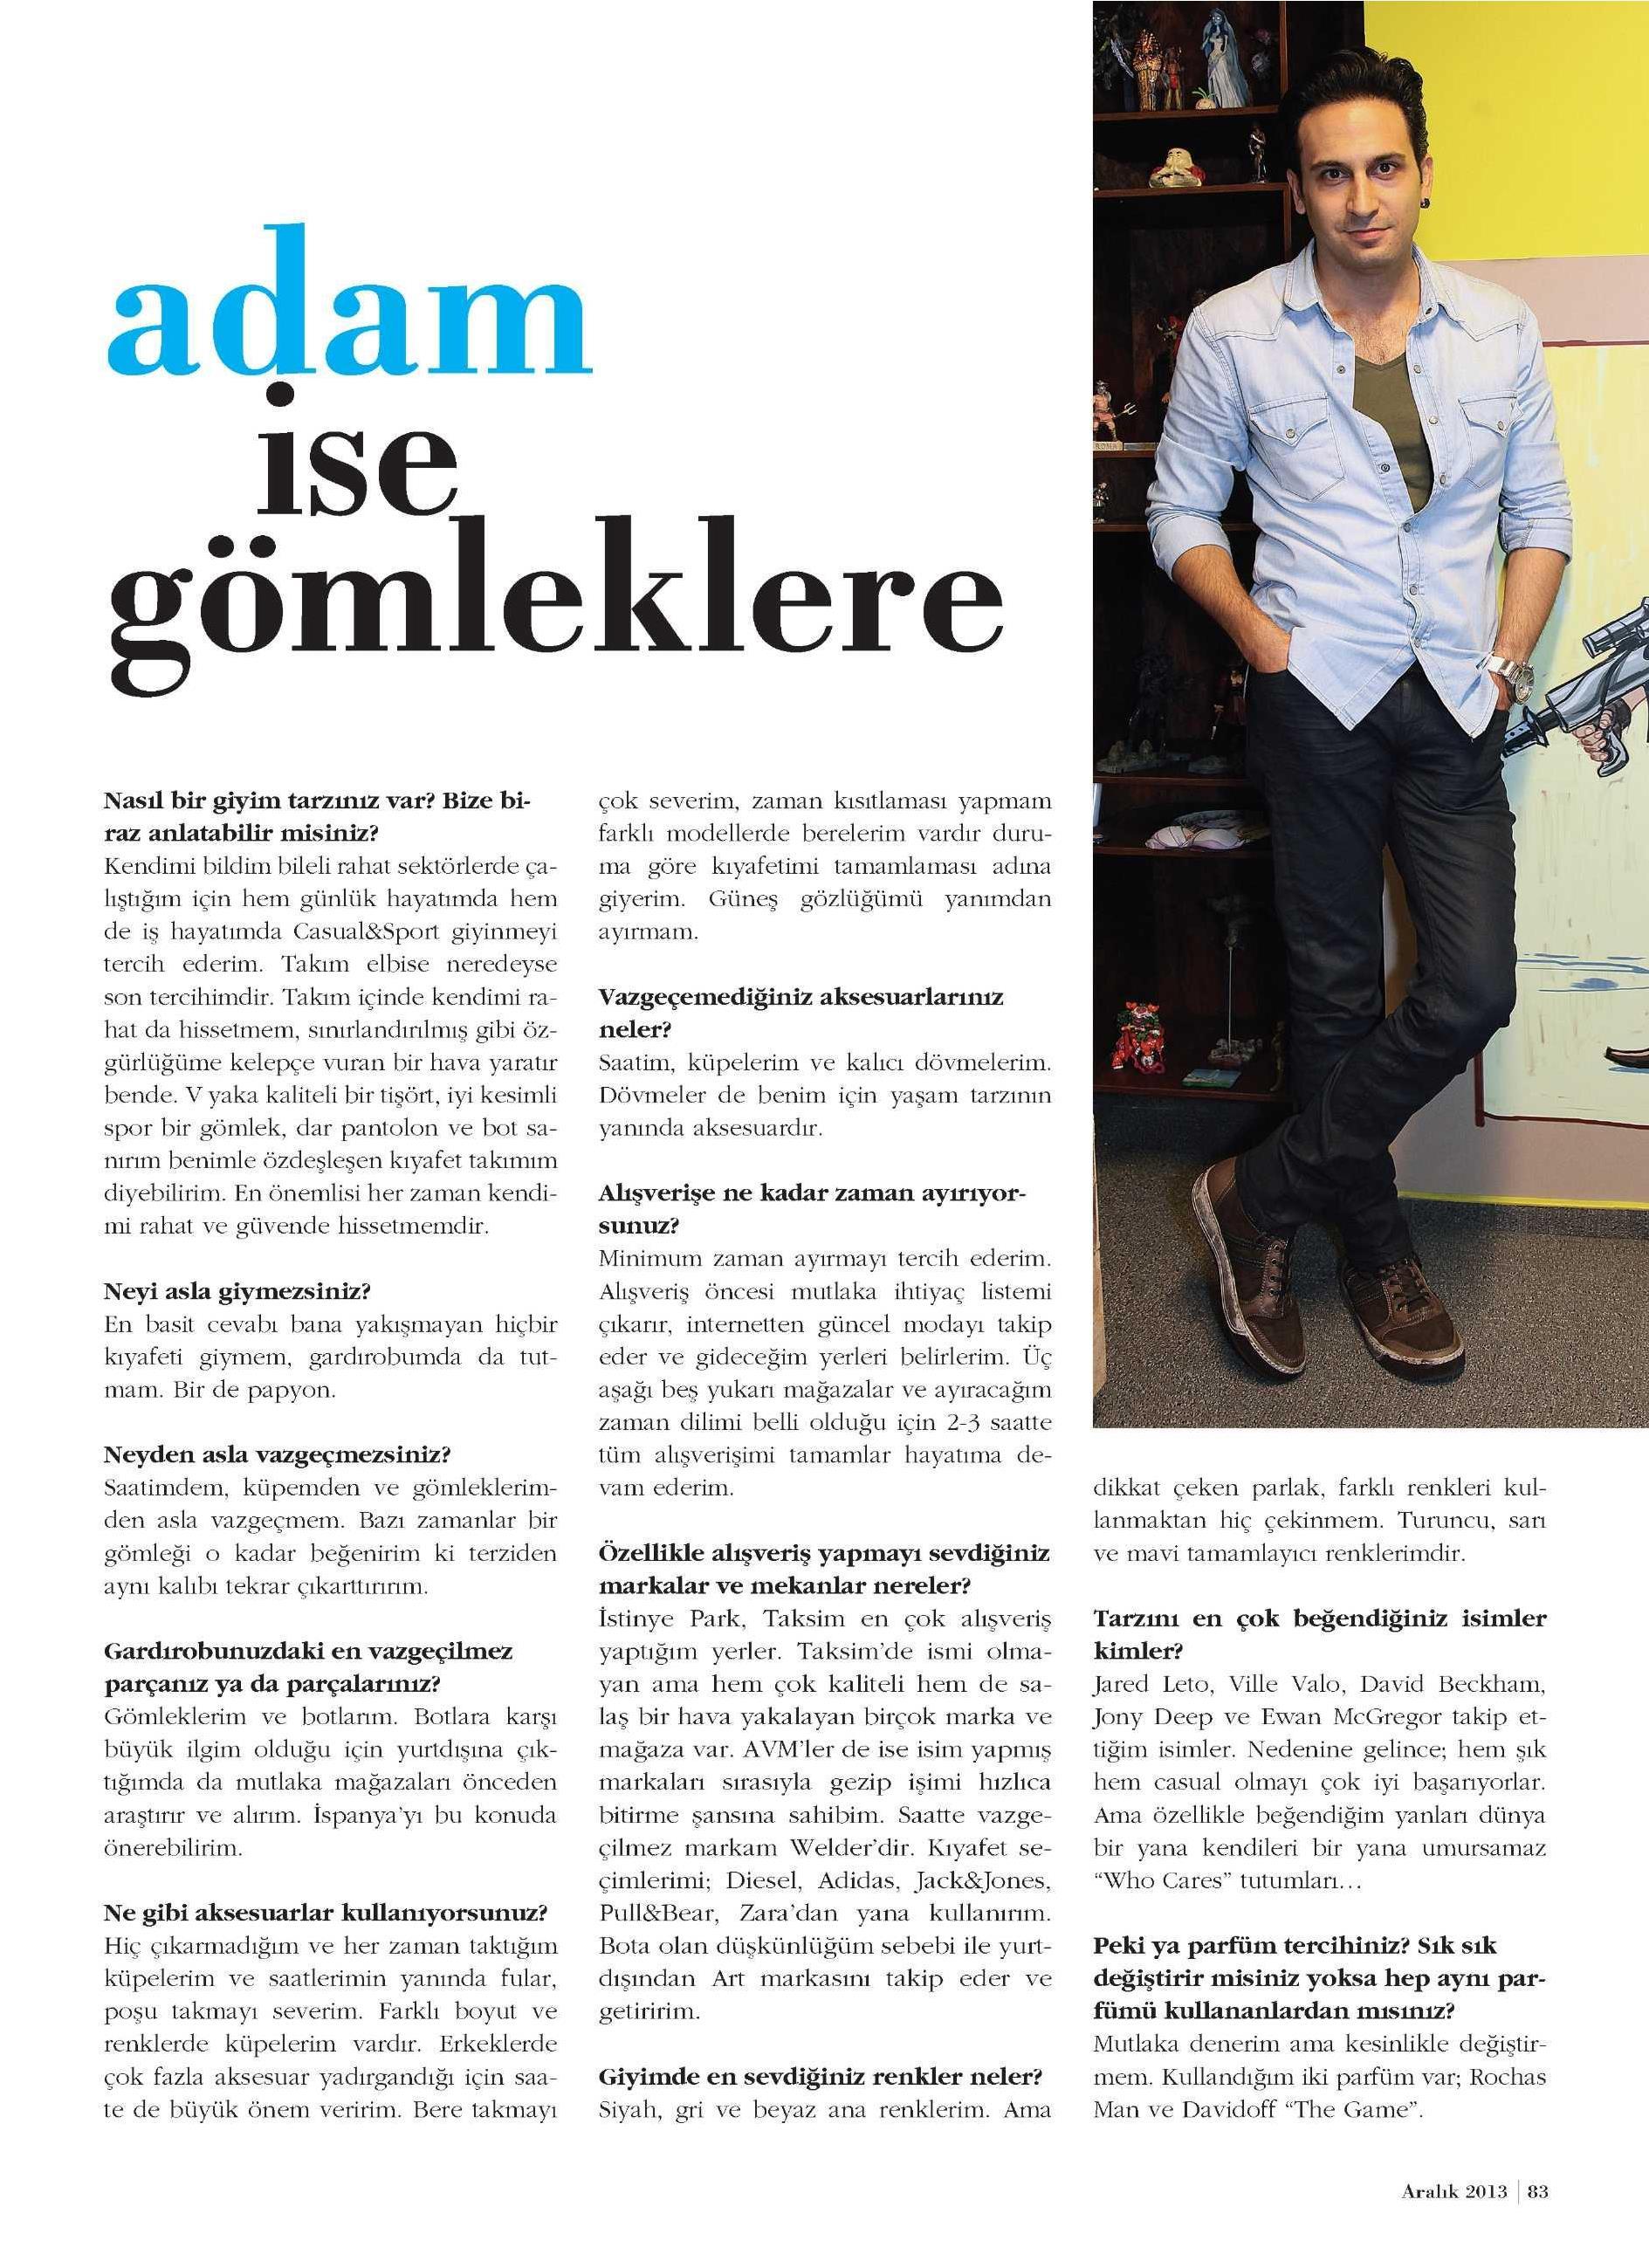 Netmarble-Turkey-Marketing-Turkiye-Magazin-Sayfa-83-1-Aralik-2013